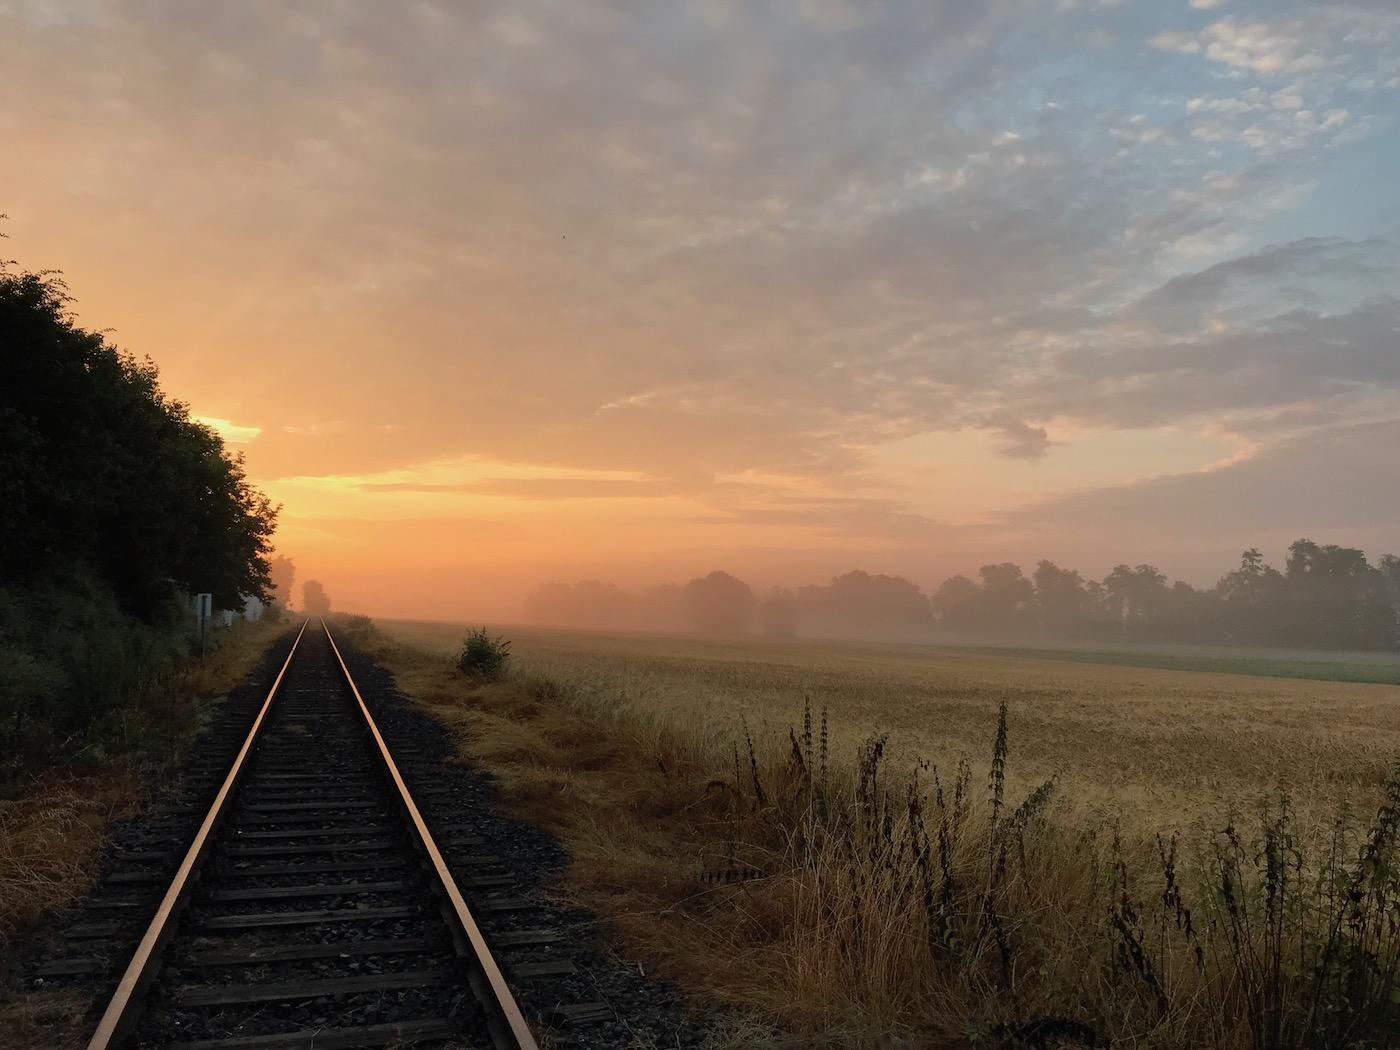 Sonnenaufgang an Bahnschiene im Feld